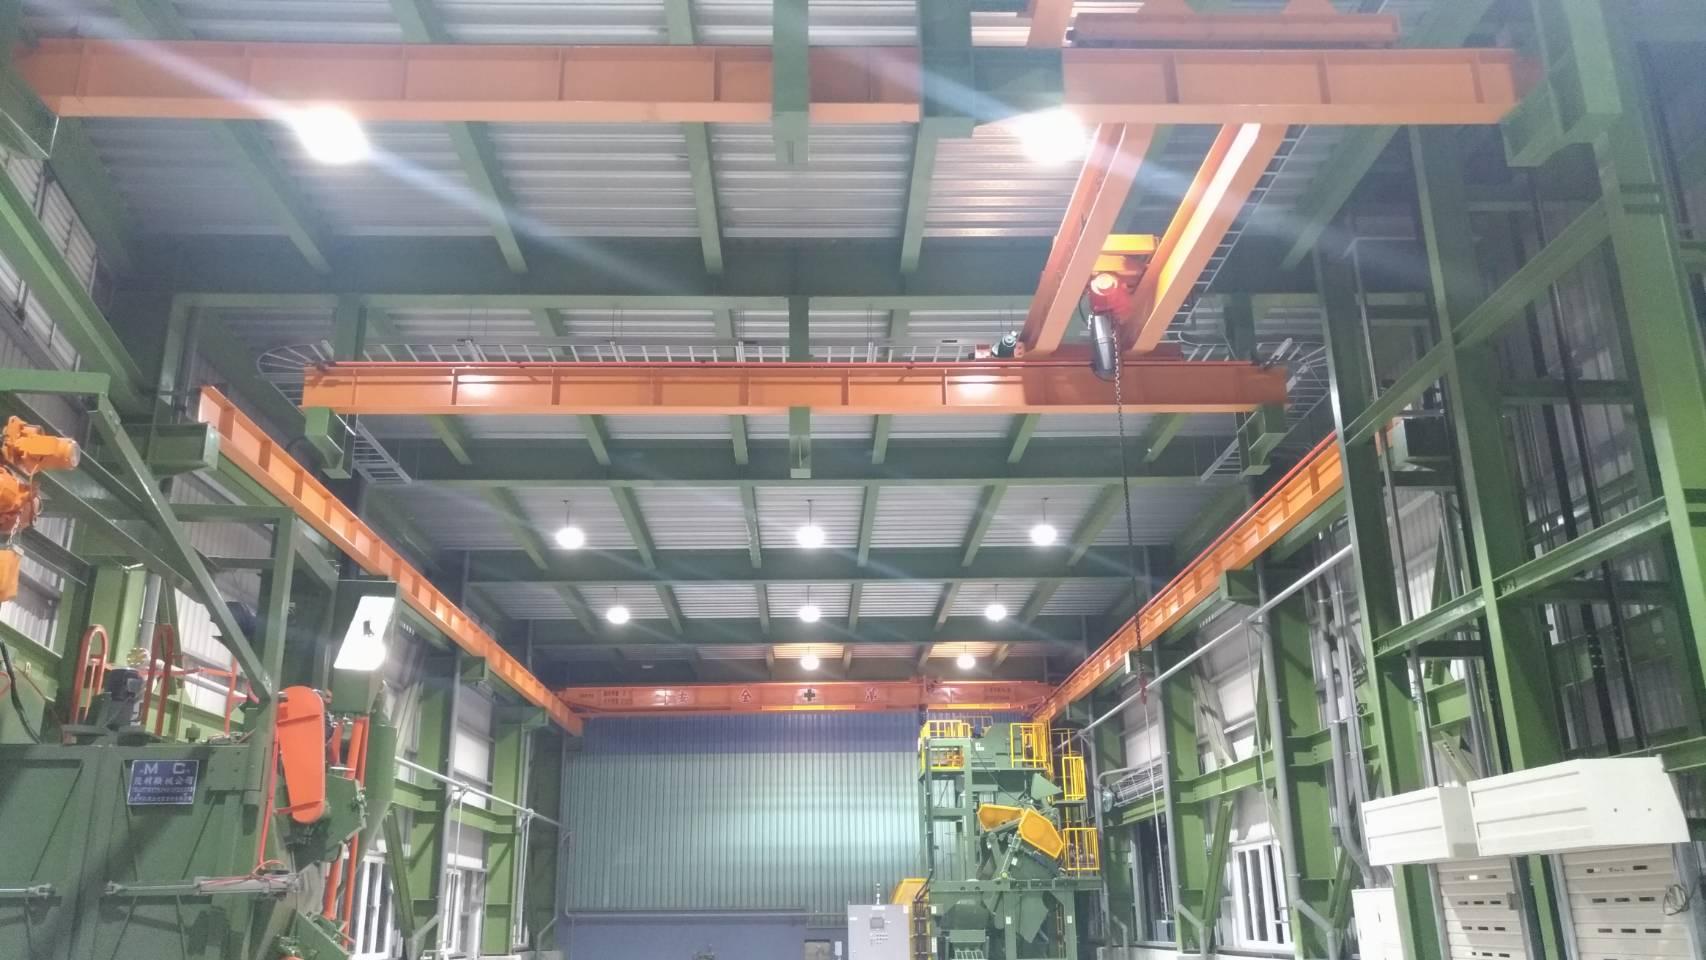 LED 天井燈,LED廠房燈,LED工礦燈製造,LED燈泡